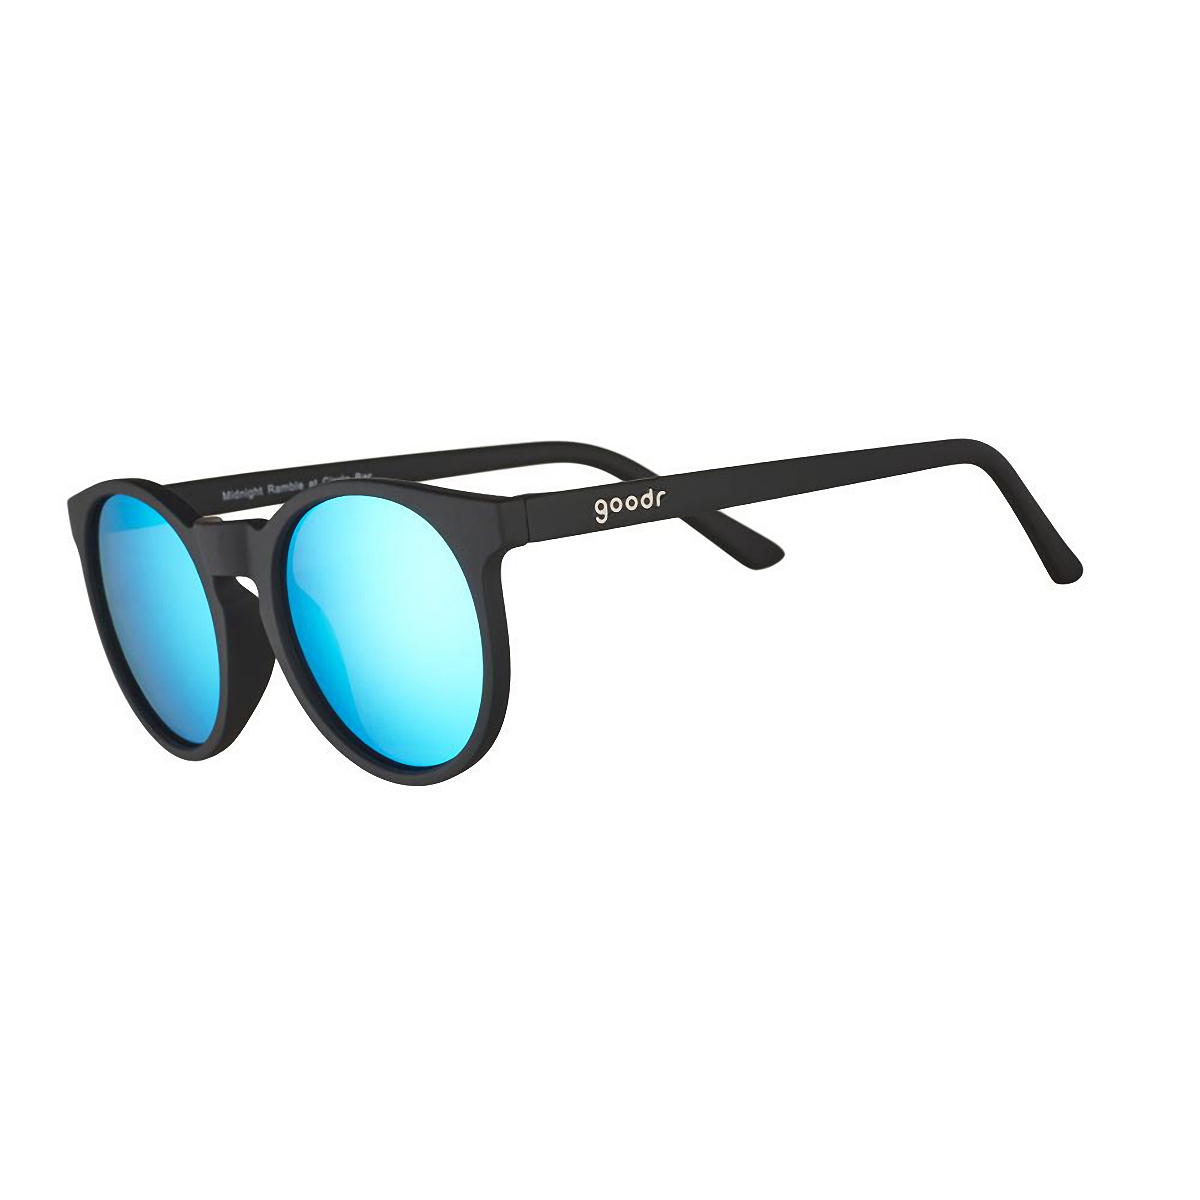 Goodr Midnight Ramble At Circle Bar Sunglasses - Color: Black - Size: OS, Black, large, image 1